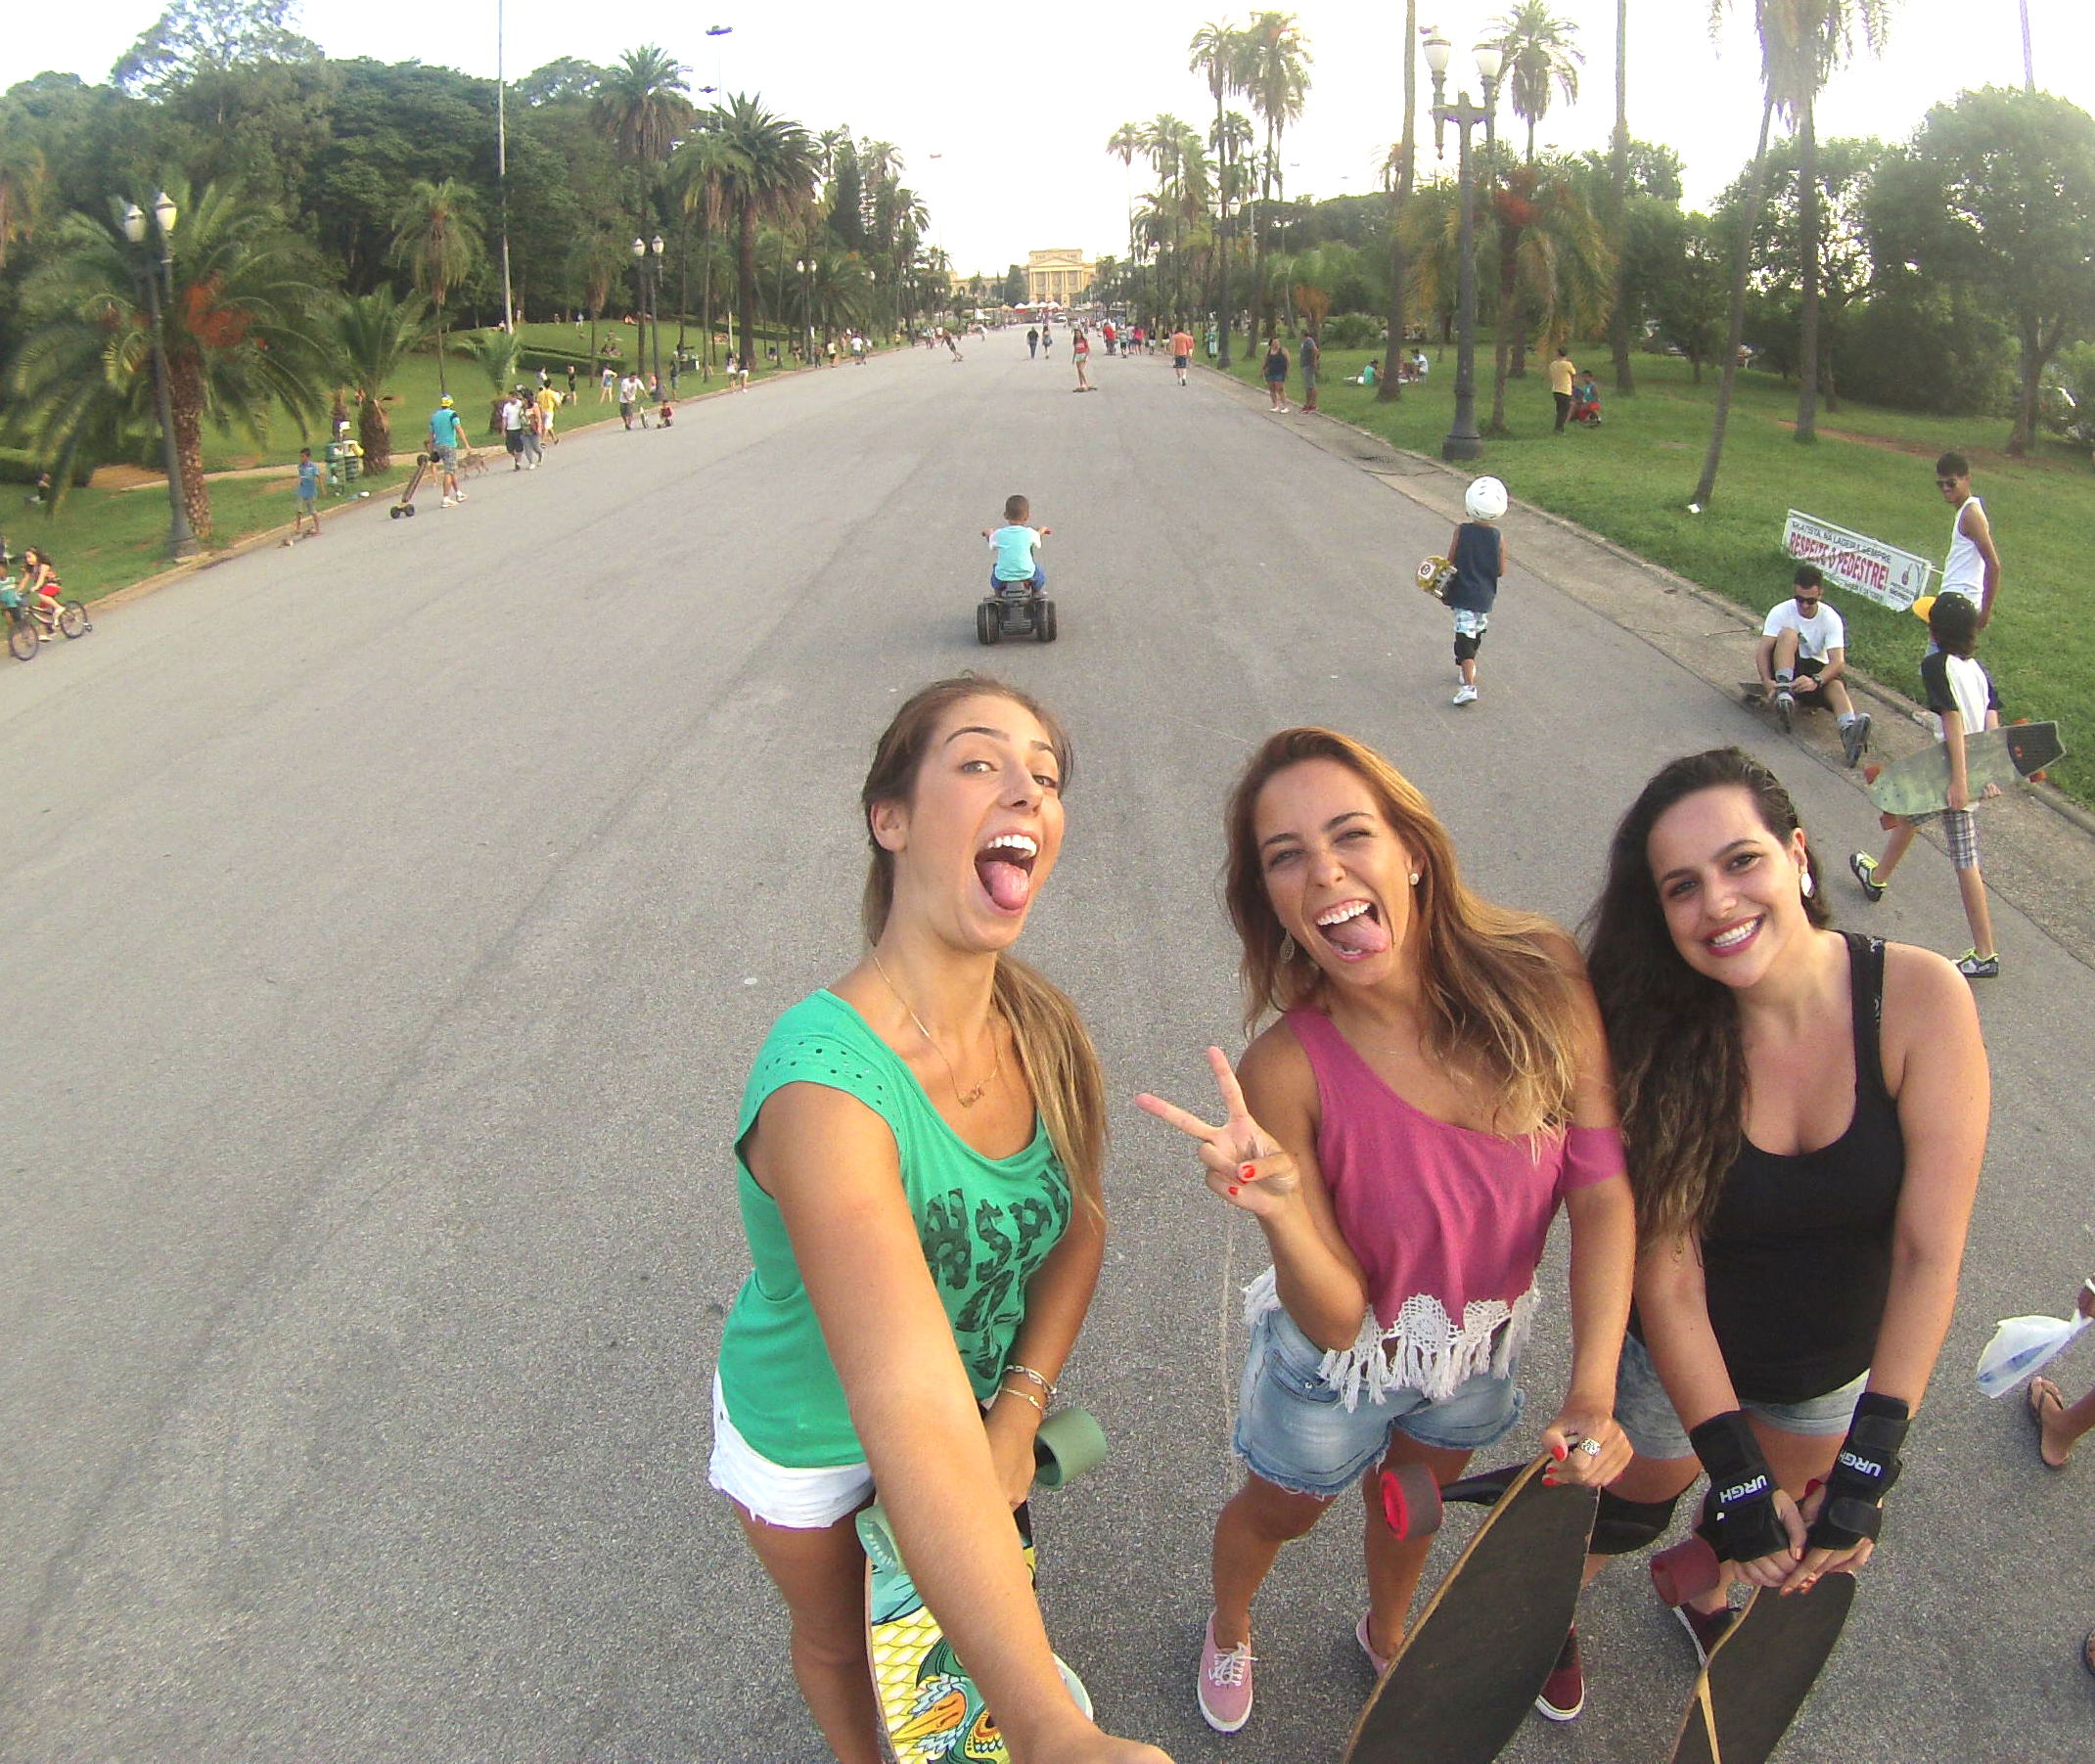 museu do ipiranga, longboard, ladeira, skateboard, skate